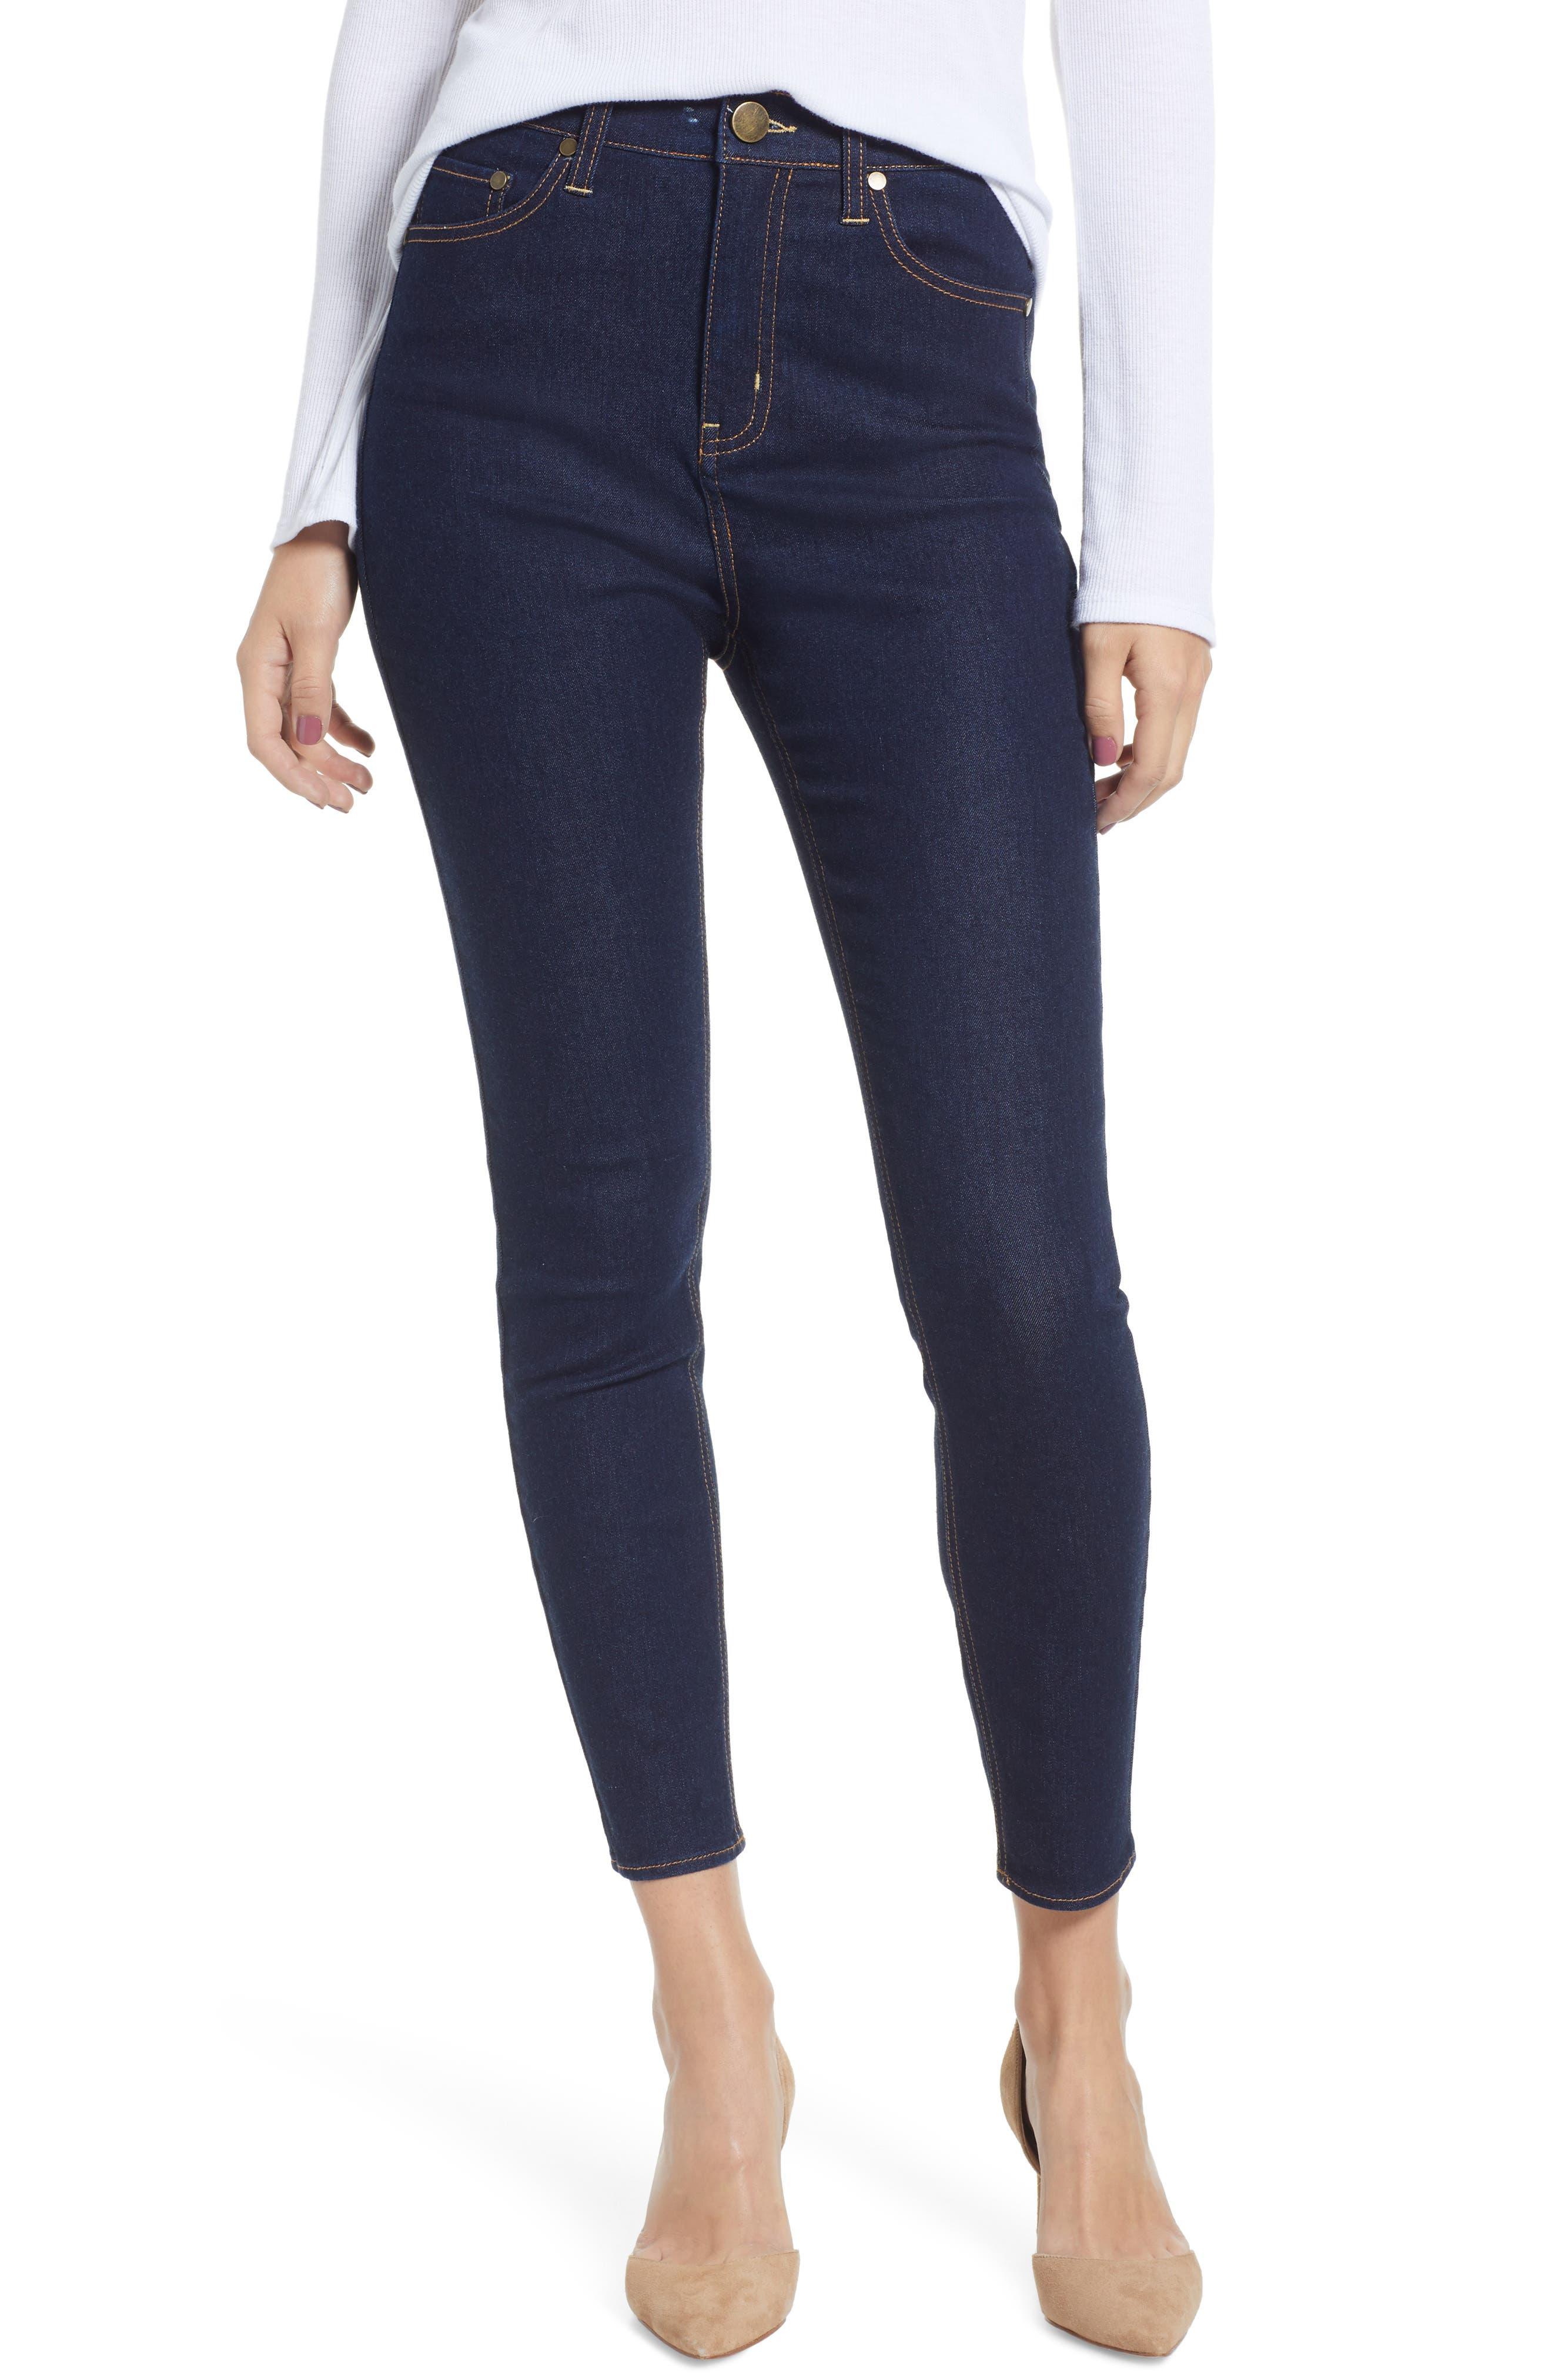 TINSEL, High Waist Skinny Jeans, Main thumbnail 1, color, 401